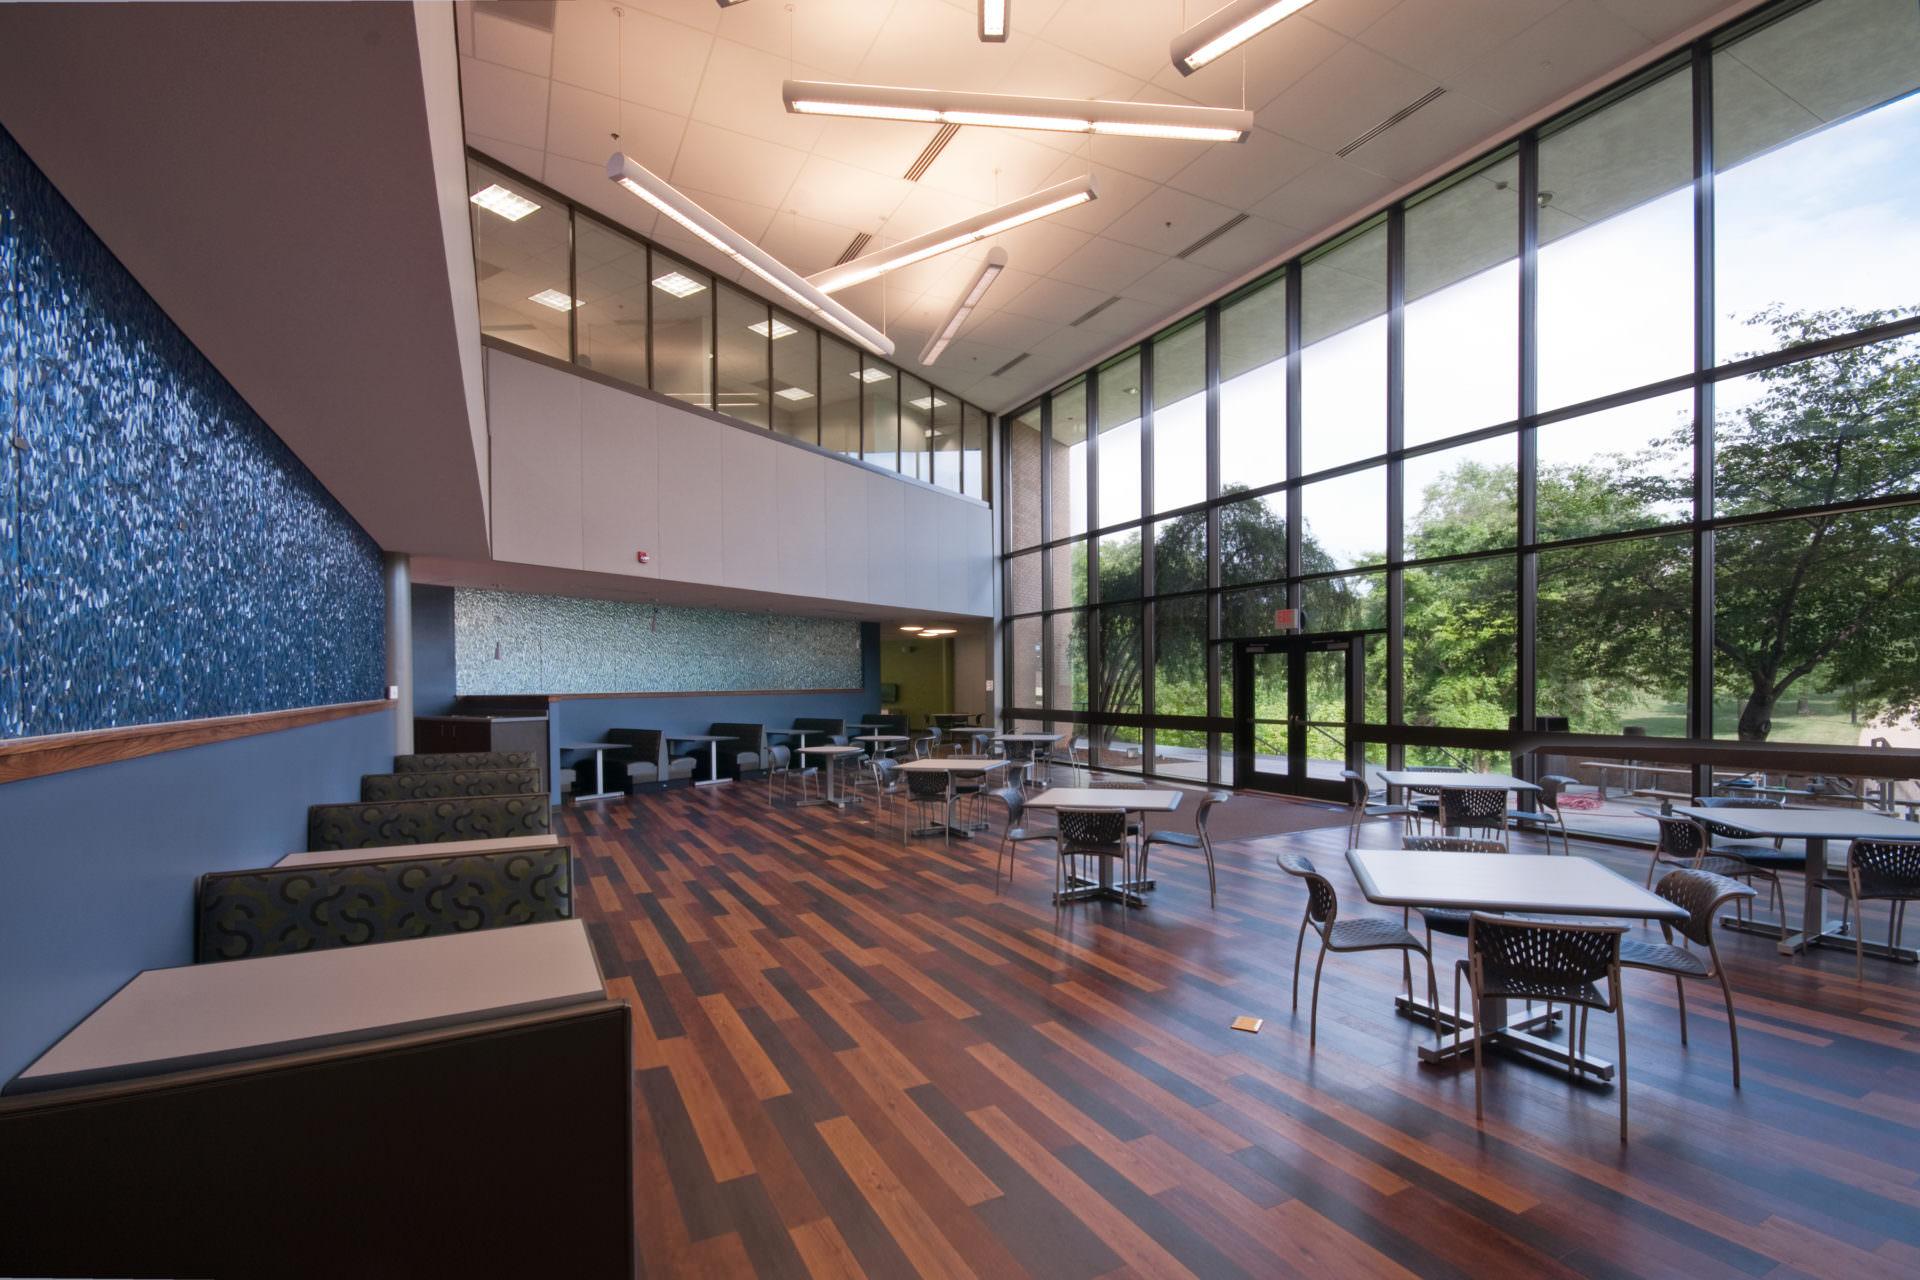 81 Interior Design Degree Greenville Sc Location Furman University Greenville Sc Postcard